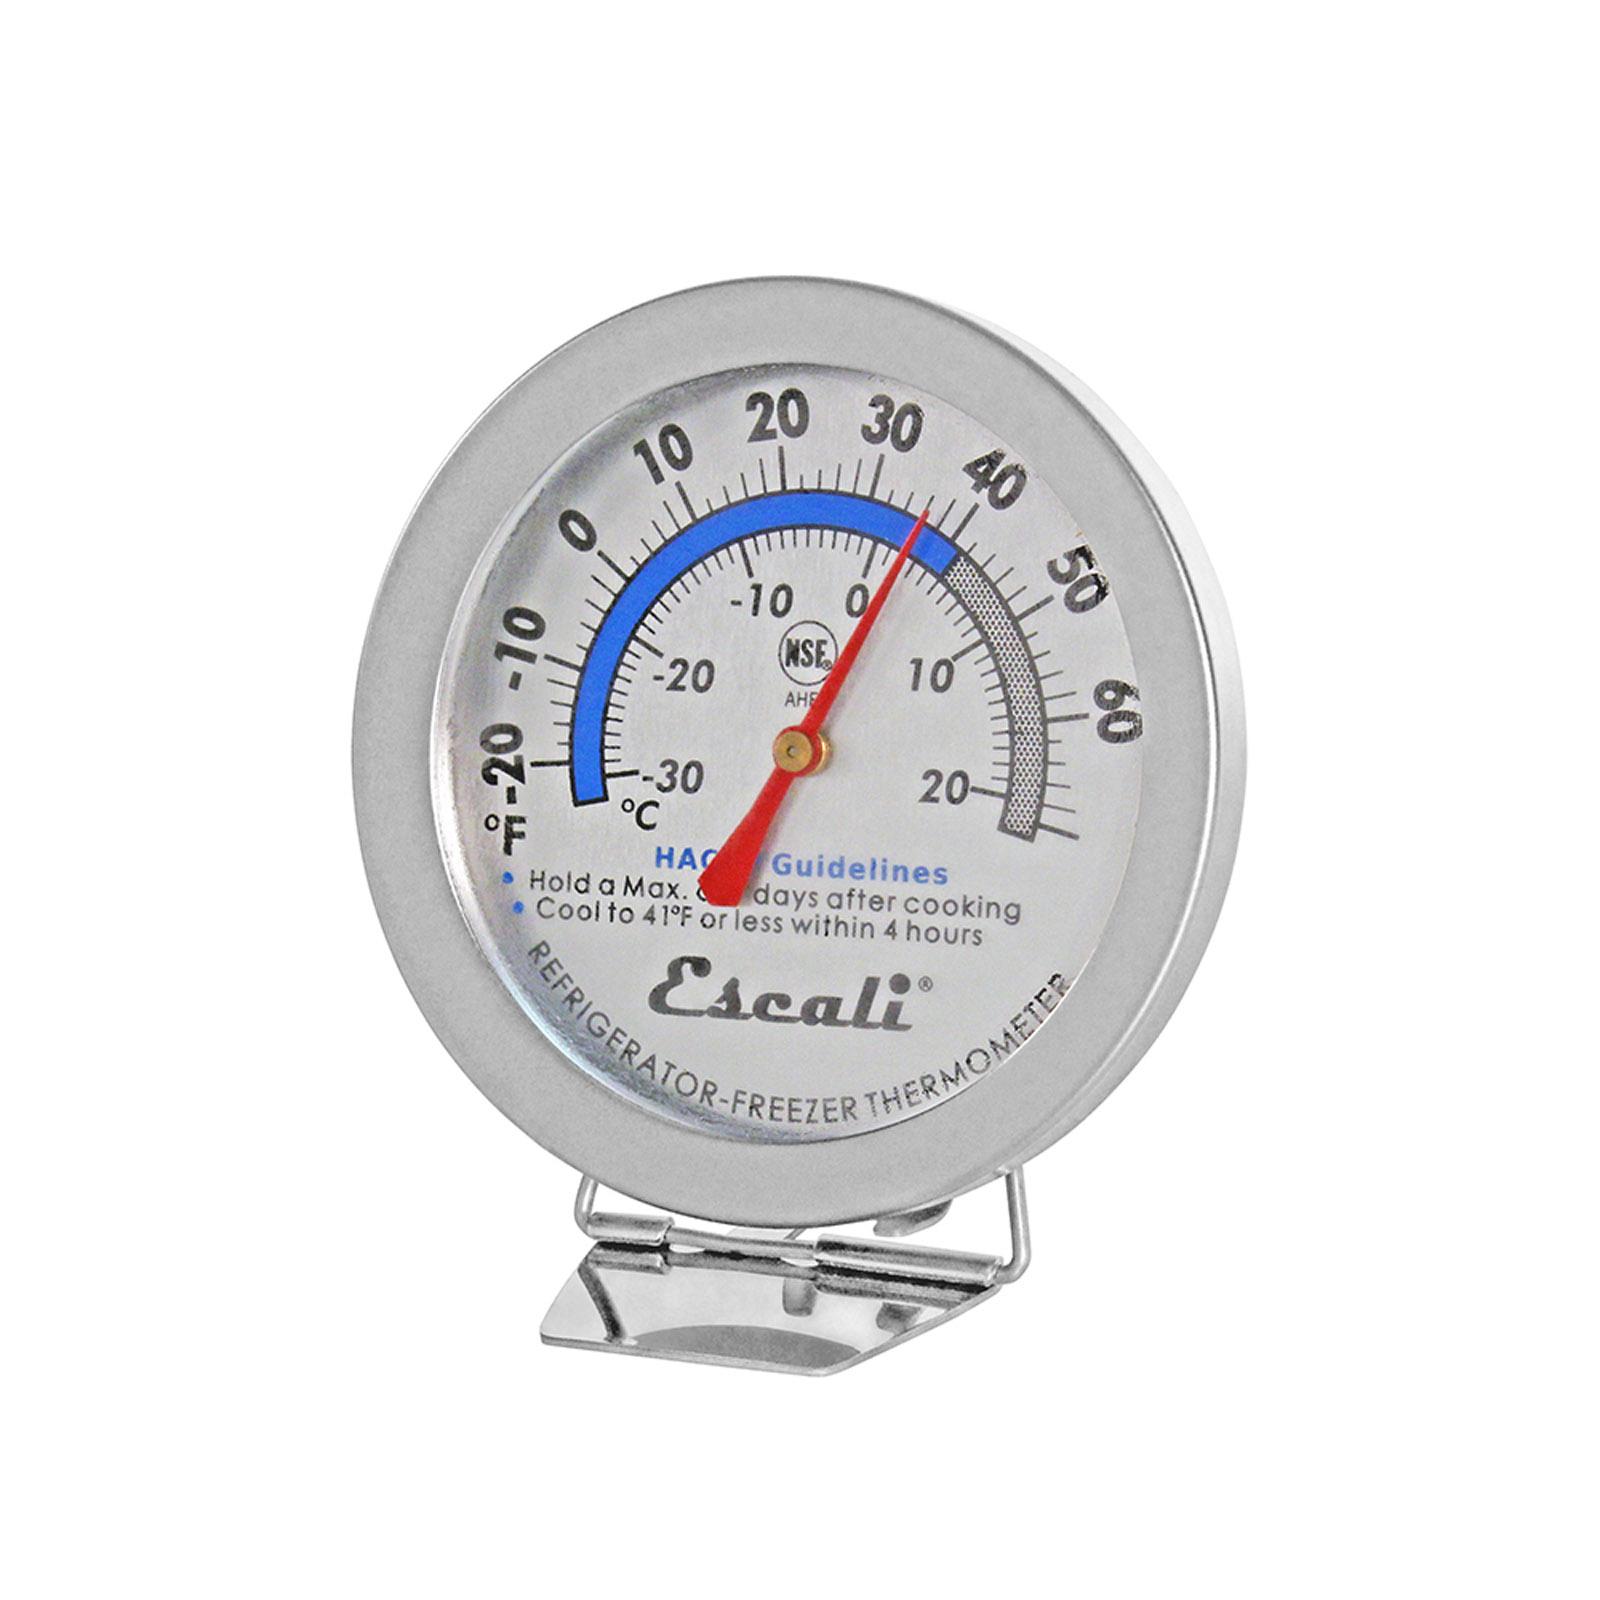 San Jamar THDLRFSS thermometer, refrig freezer